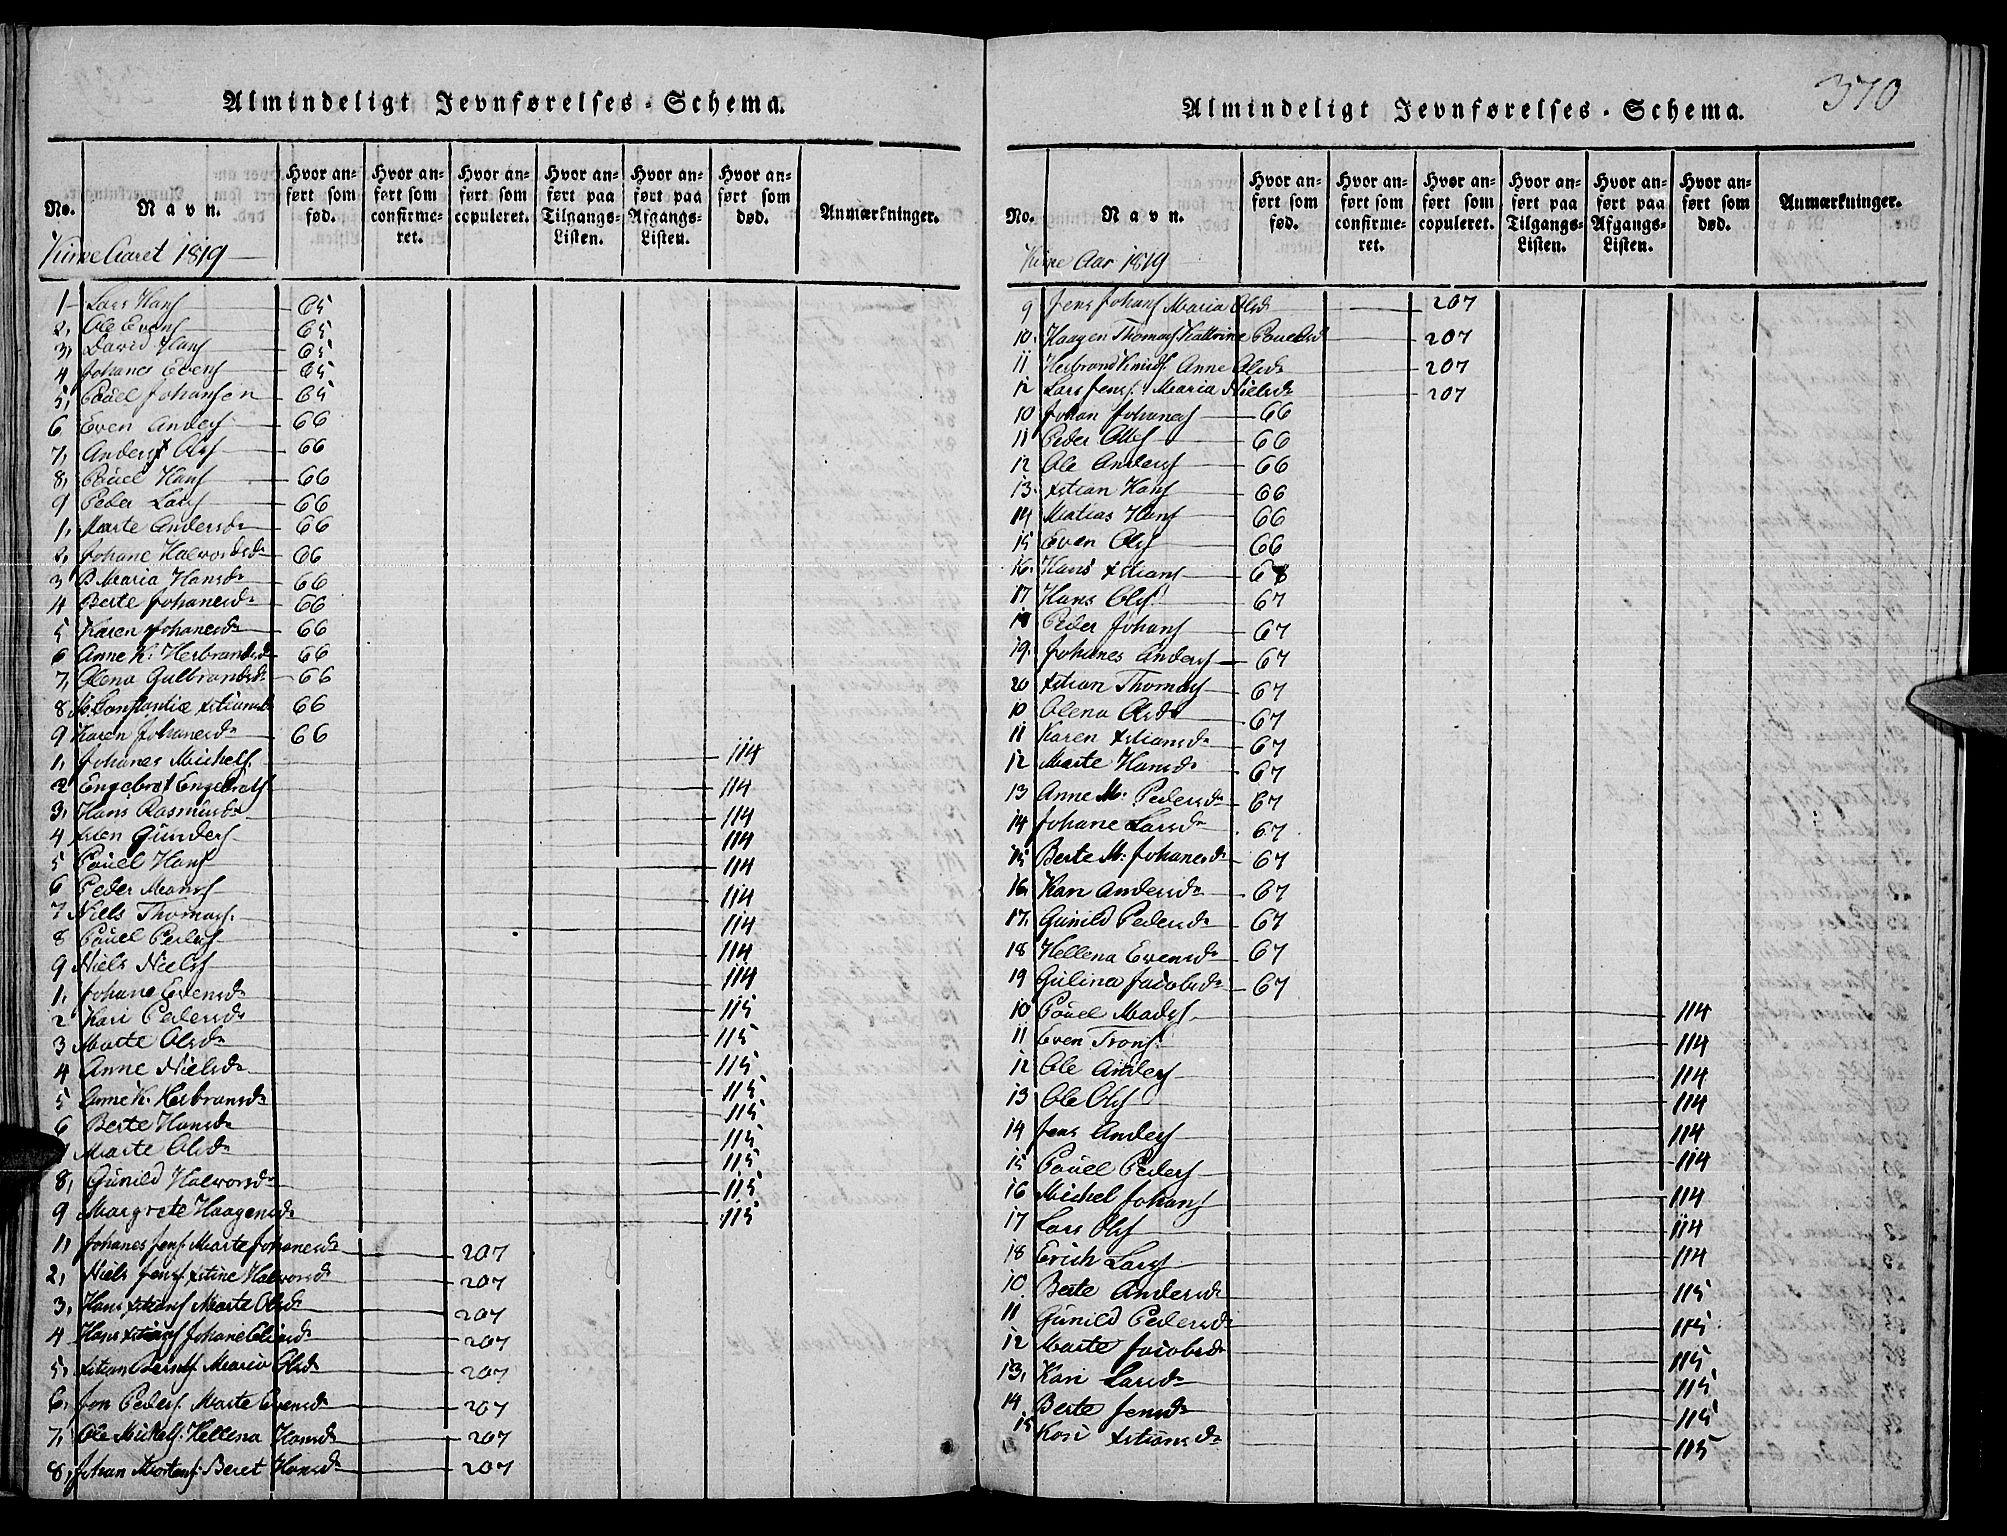 SAH, Toten prestekontor, Ministerialbok nr. 9, 1814-1820, s. 370a